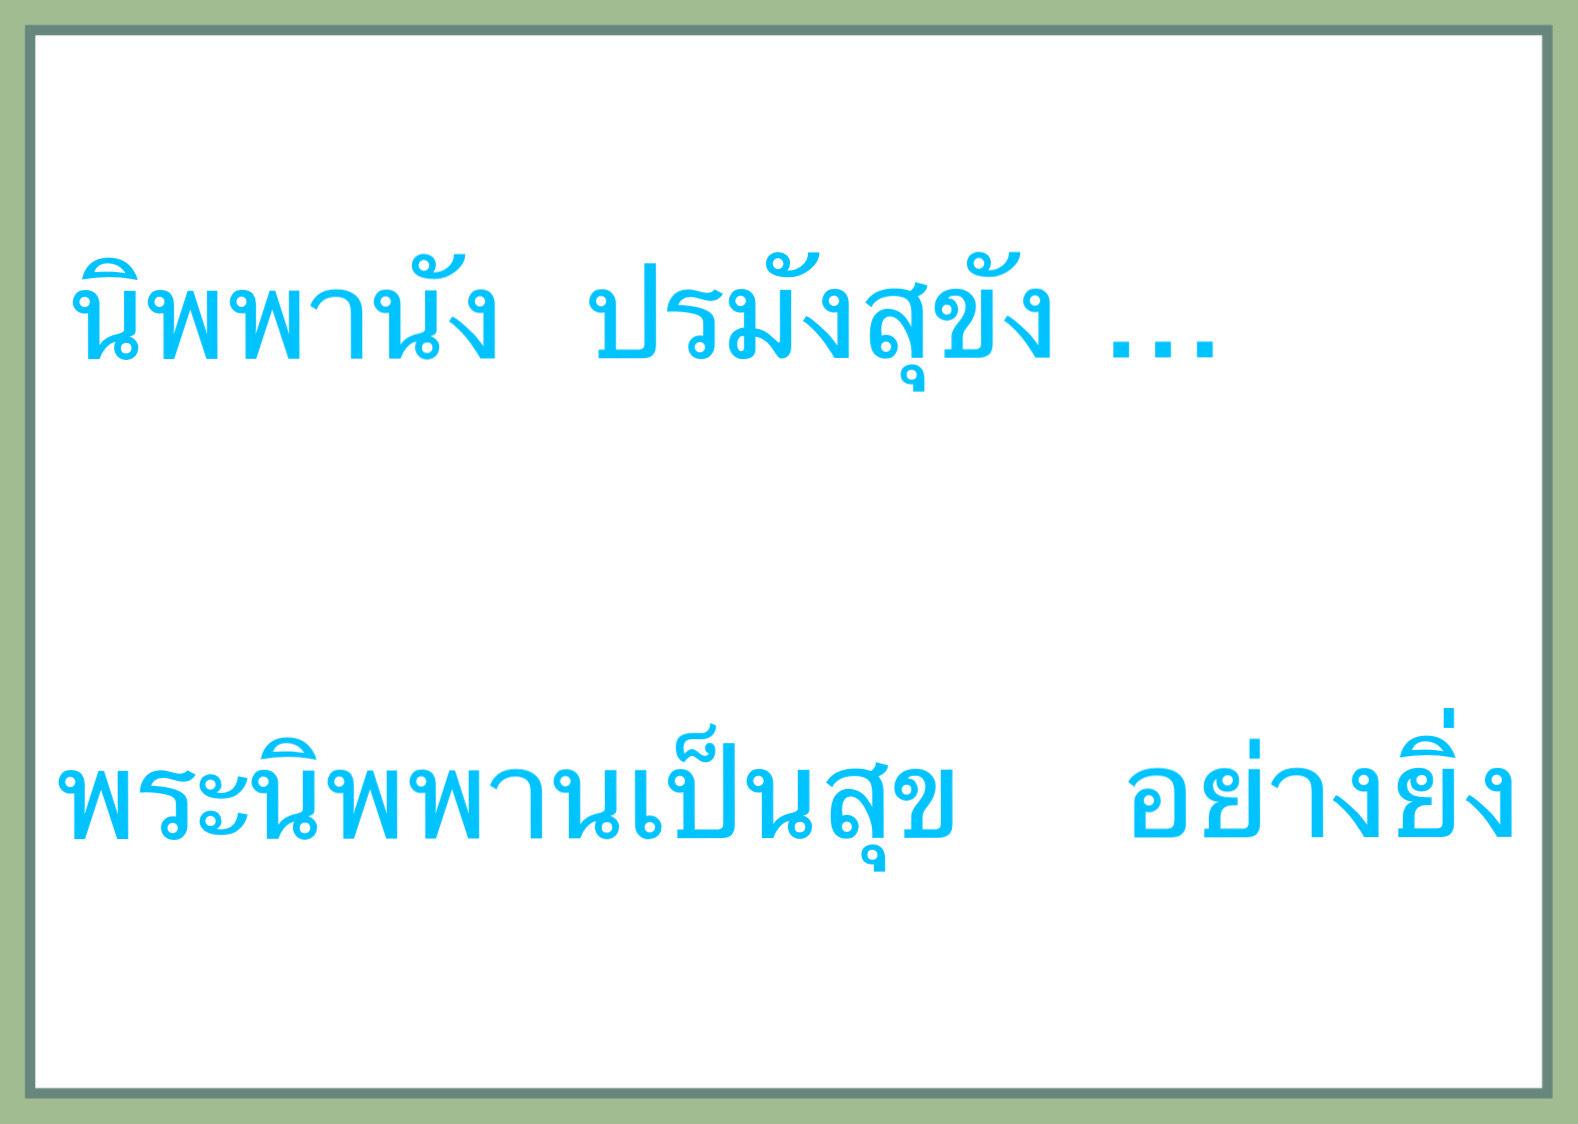 kaC3YCH.jpg